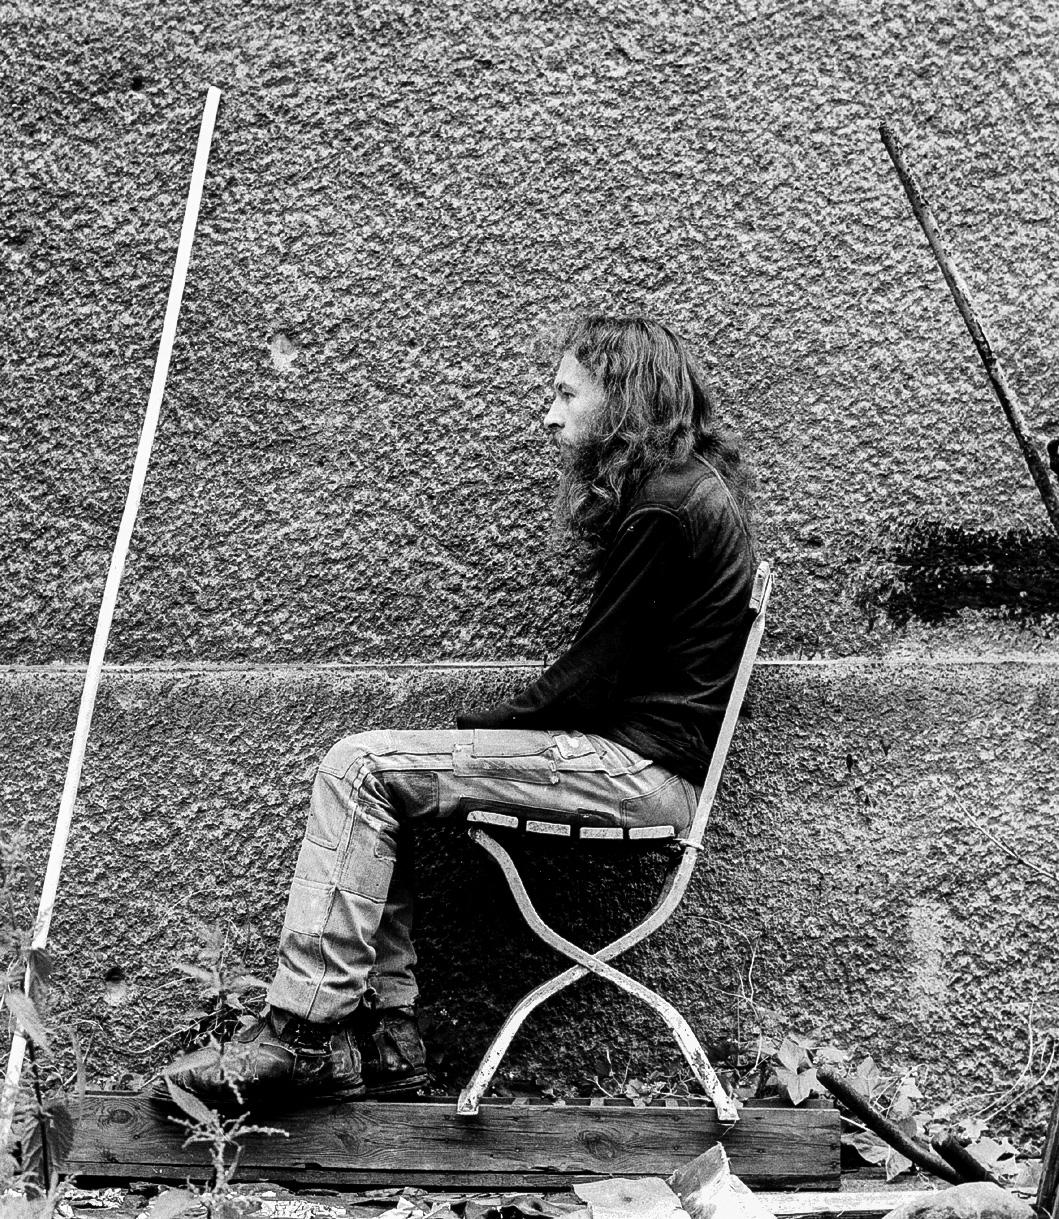 Andrzej Dudek-Dürer, I'm Waiting…, 1985. DTZSP collection